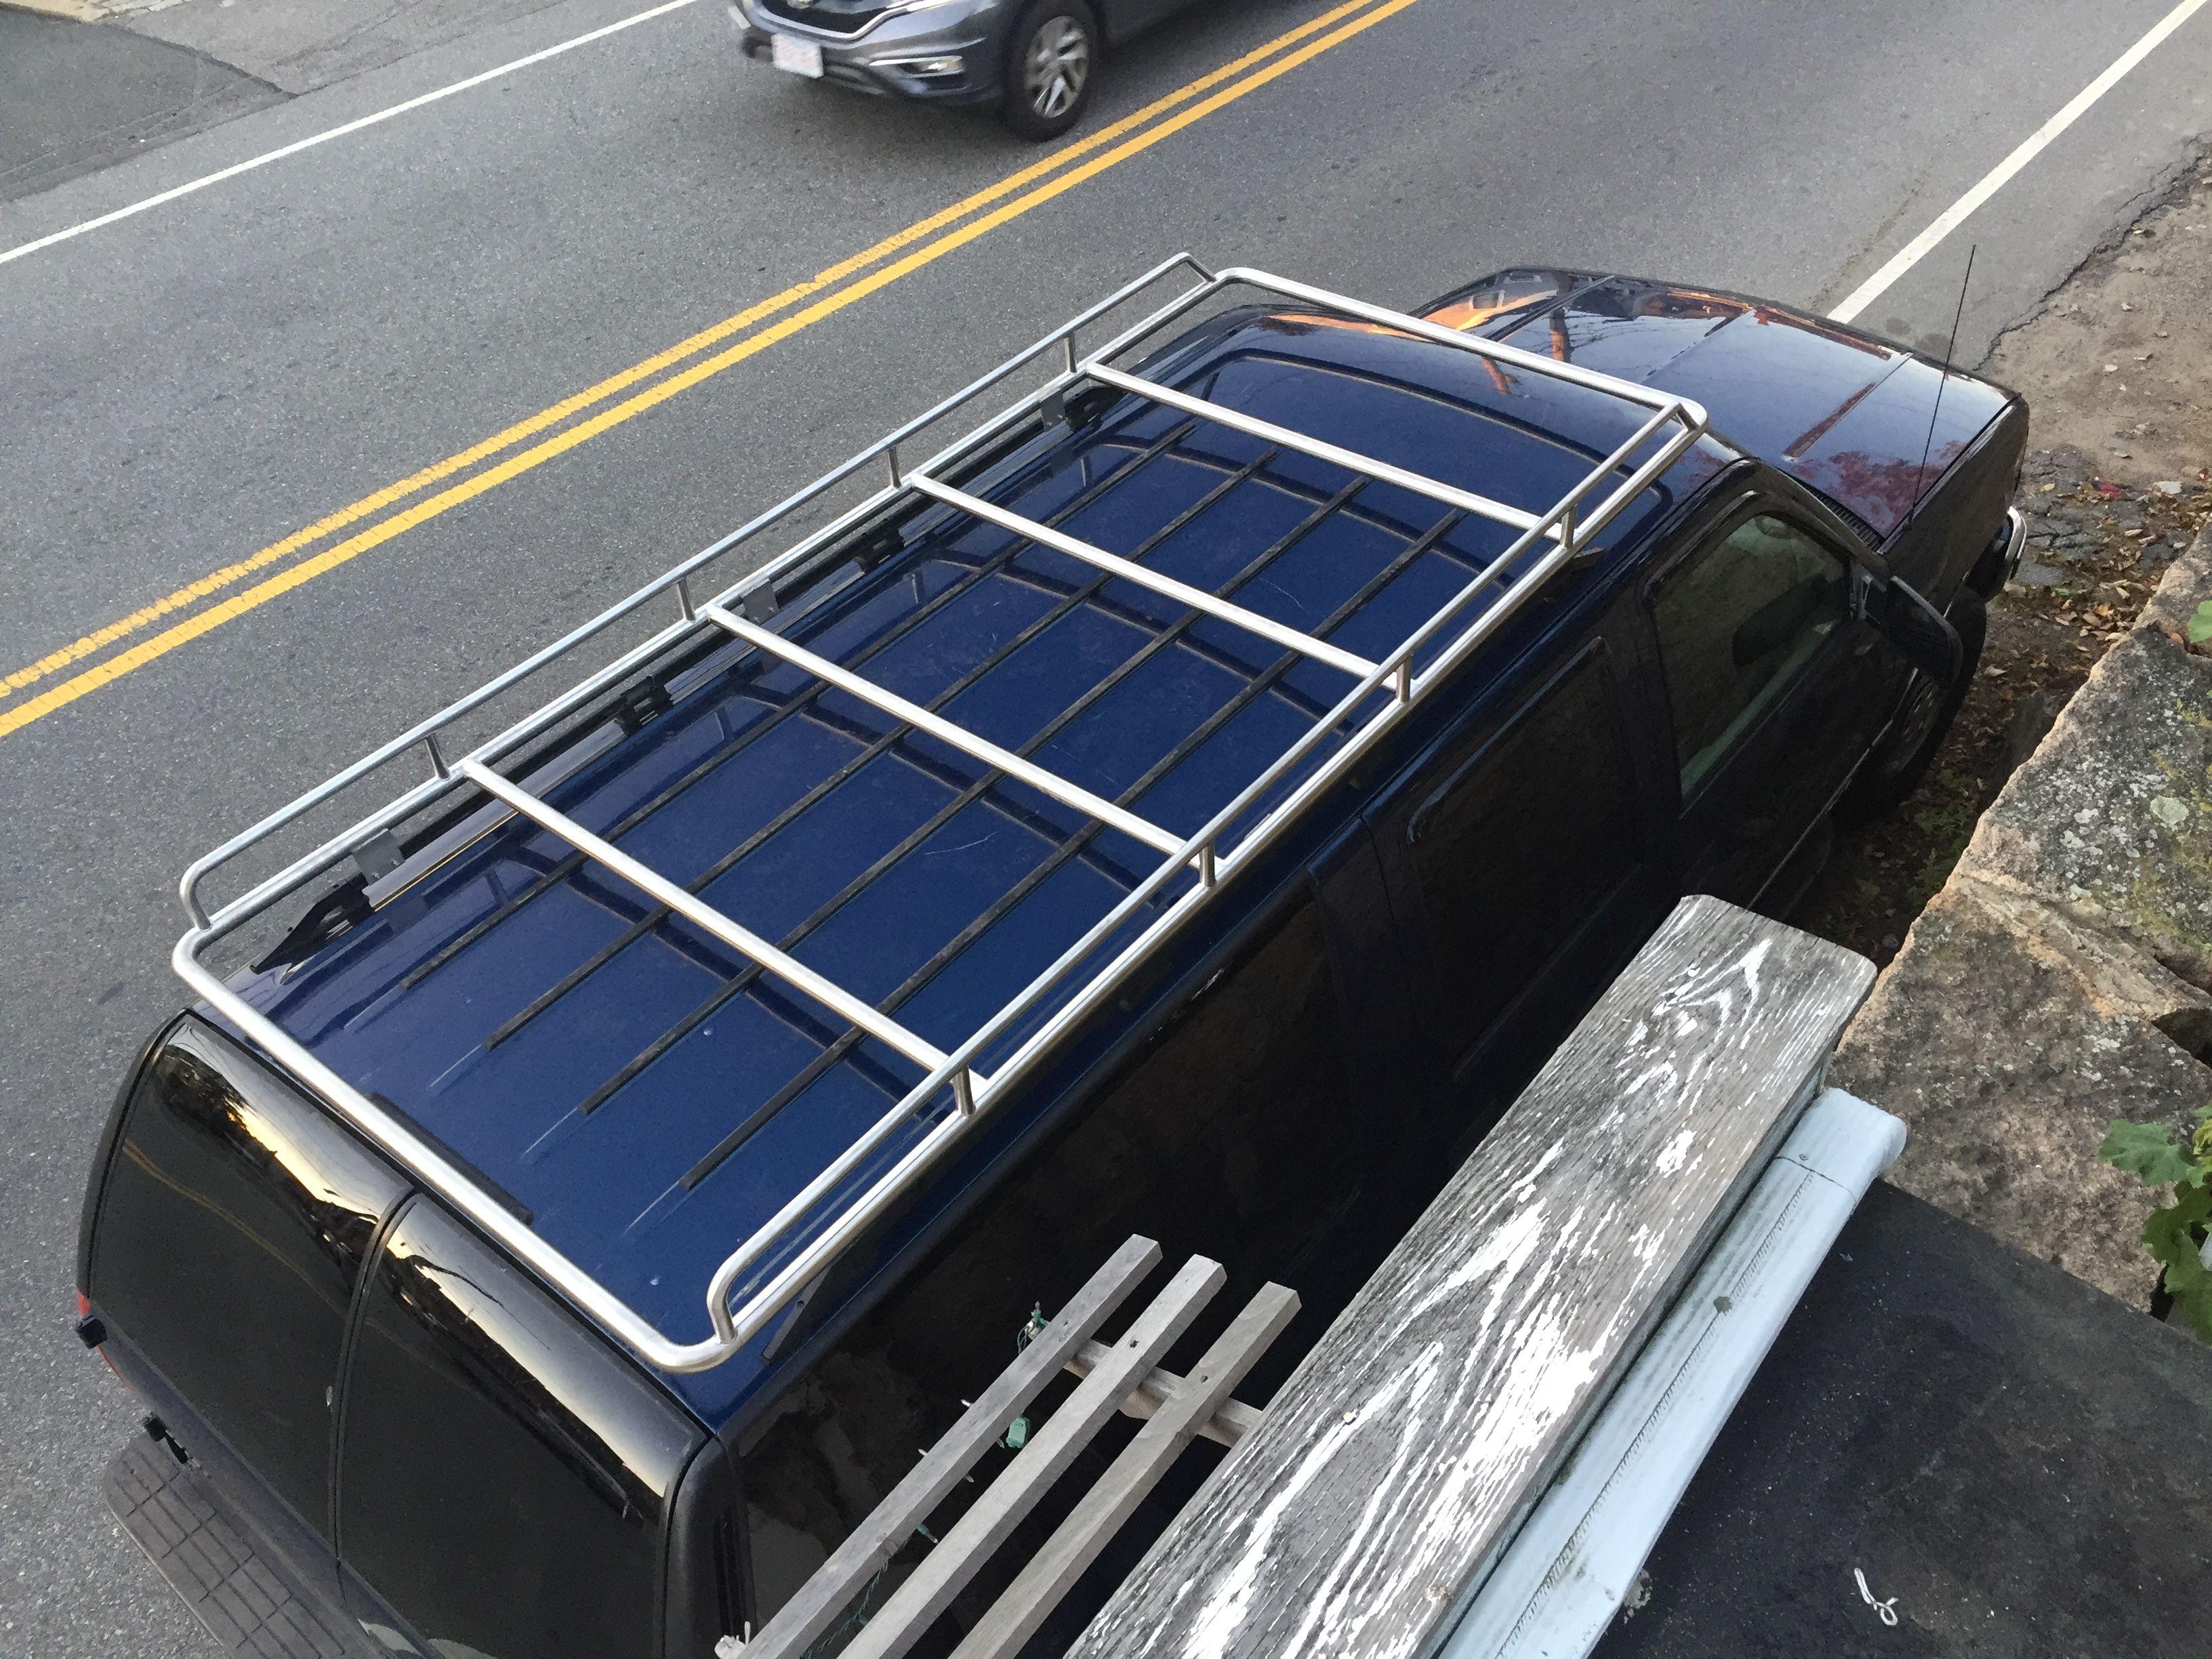 Chevy suburban roof rack | Suburban ideas | Pinterest ...